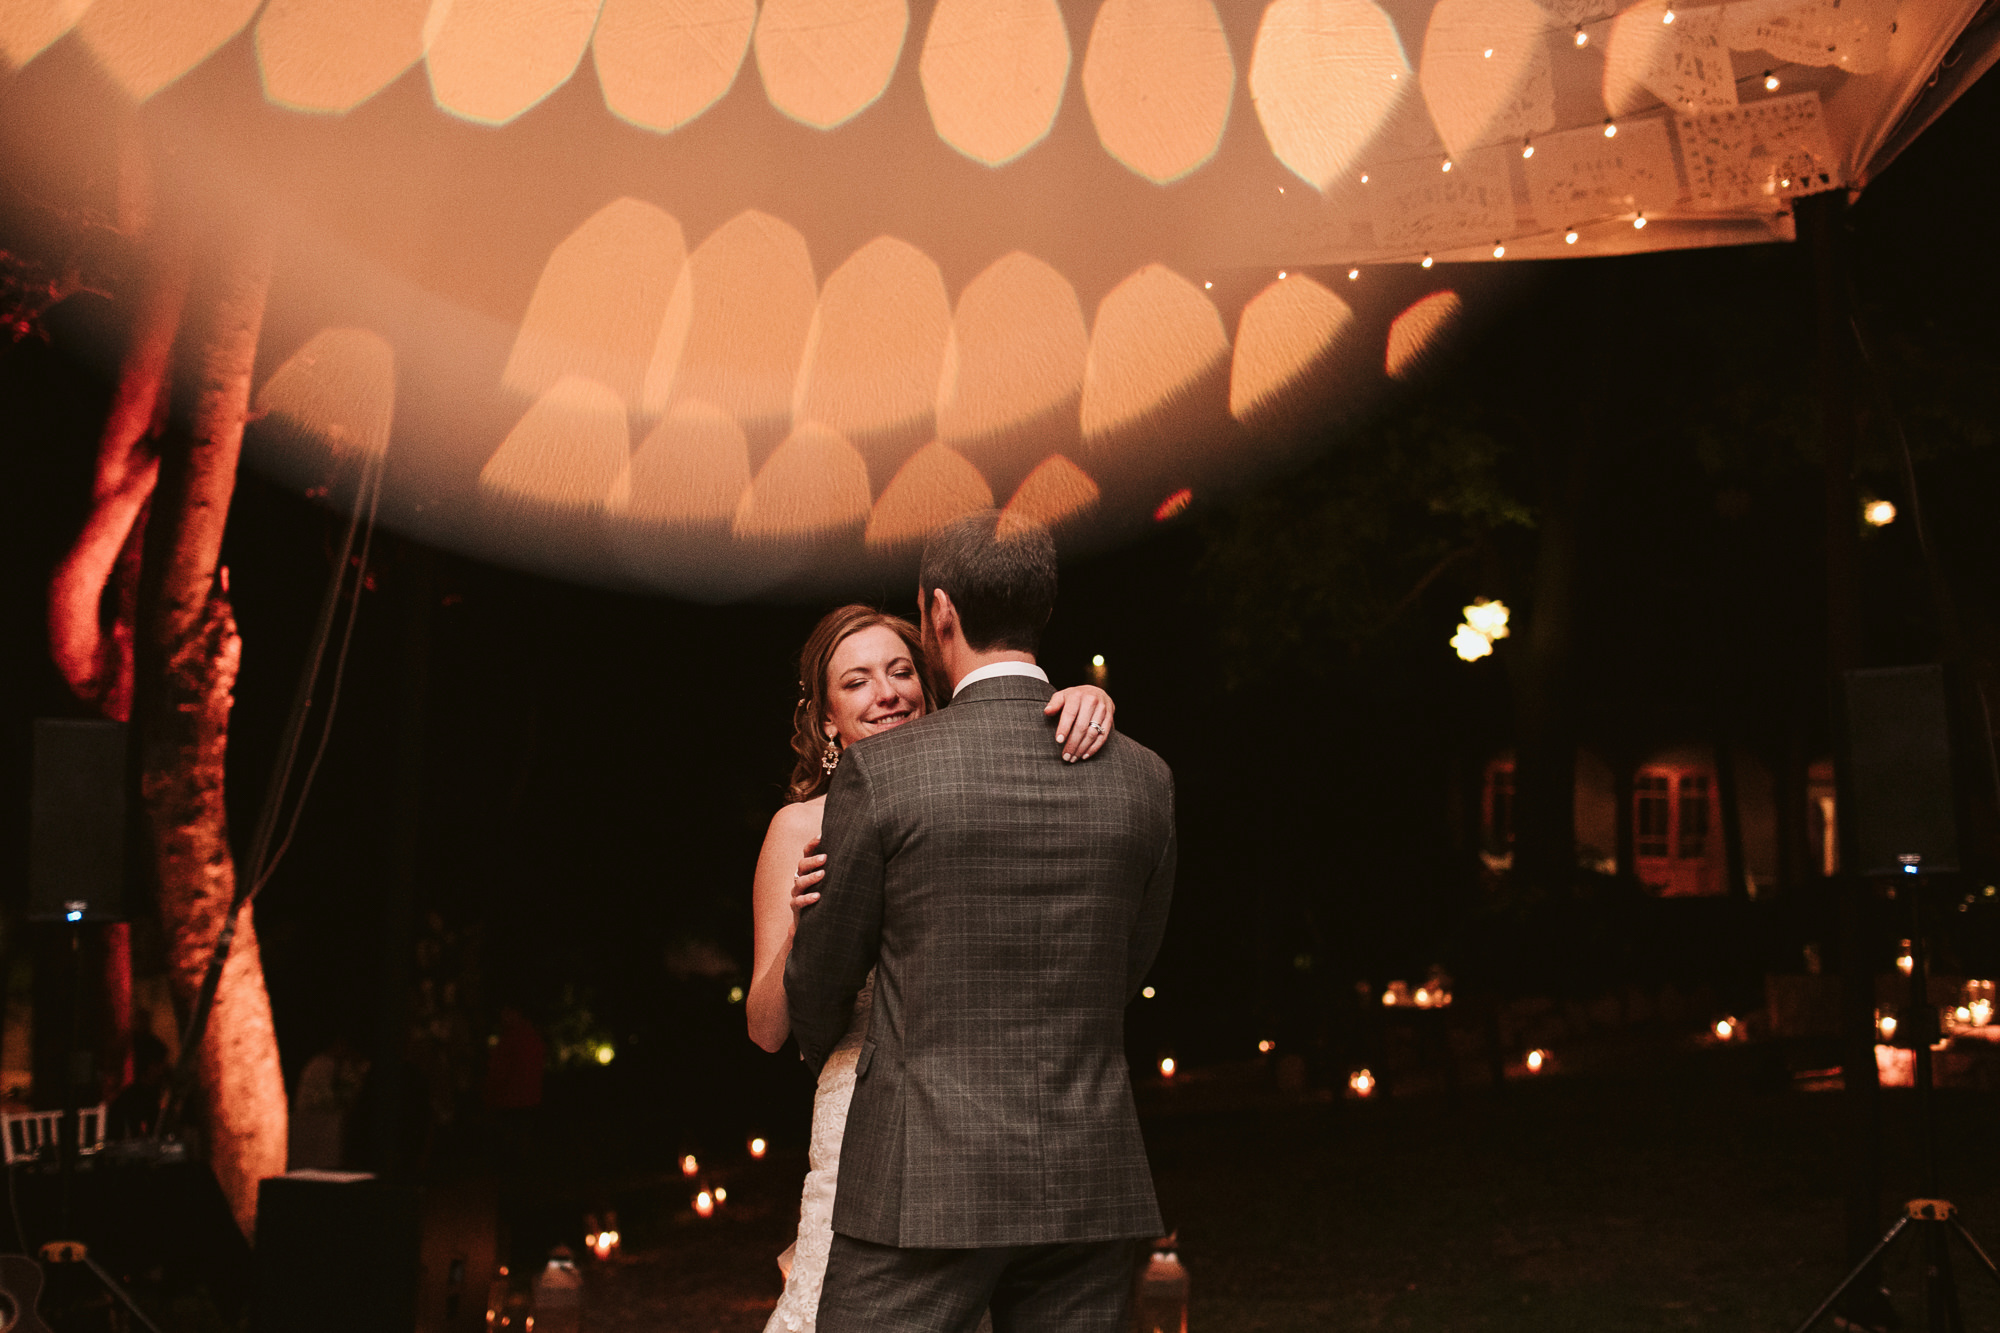 Destination-wedding-photographer-201.jpg